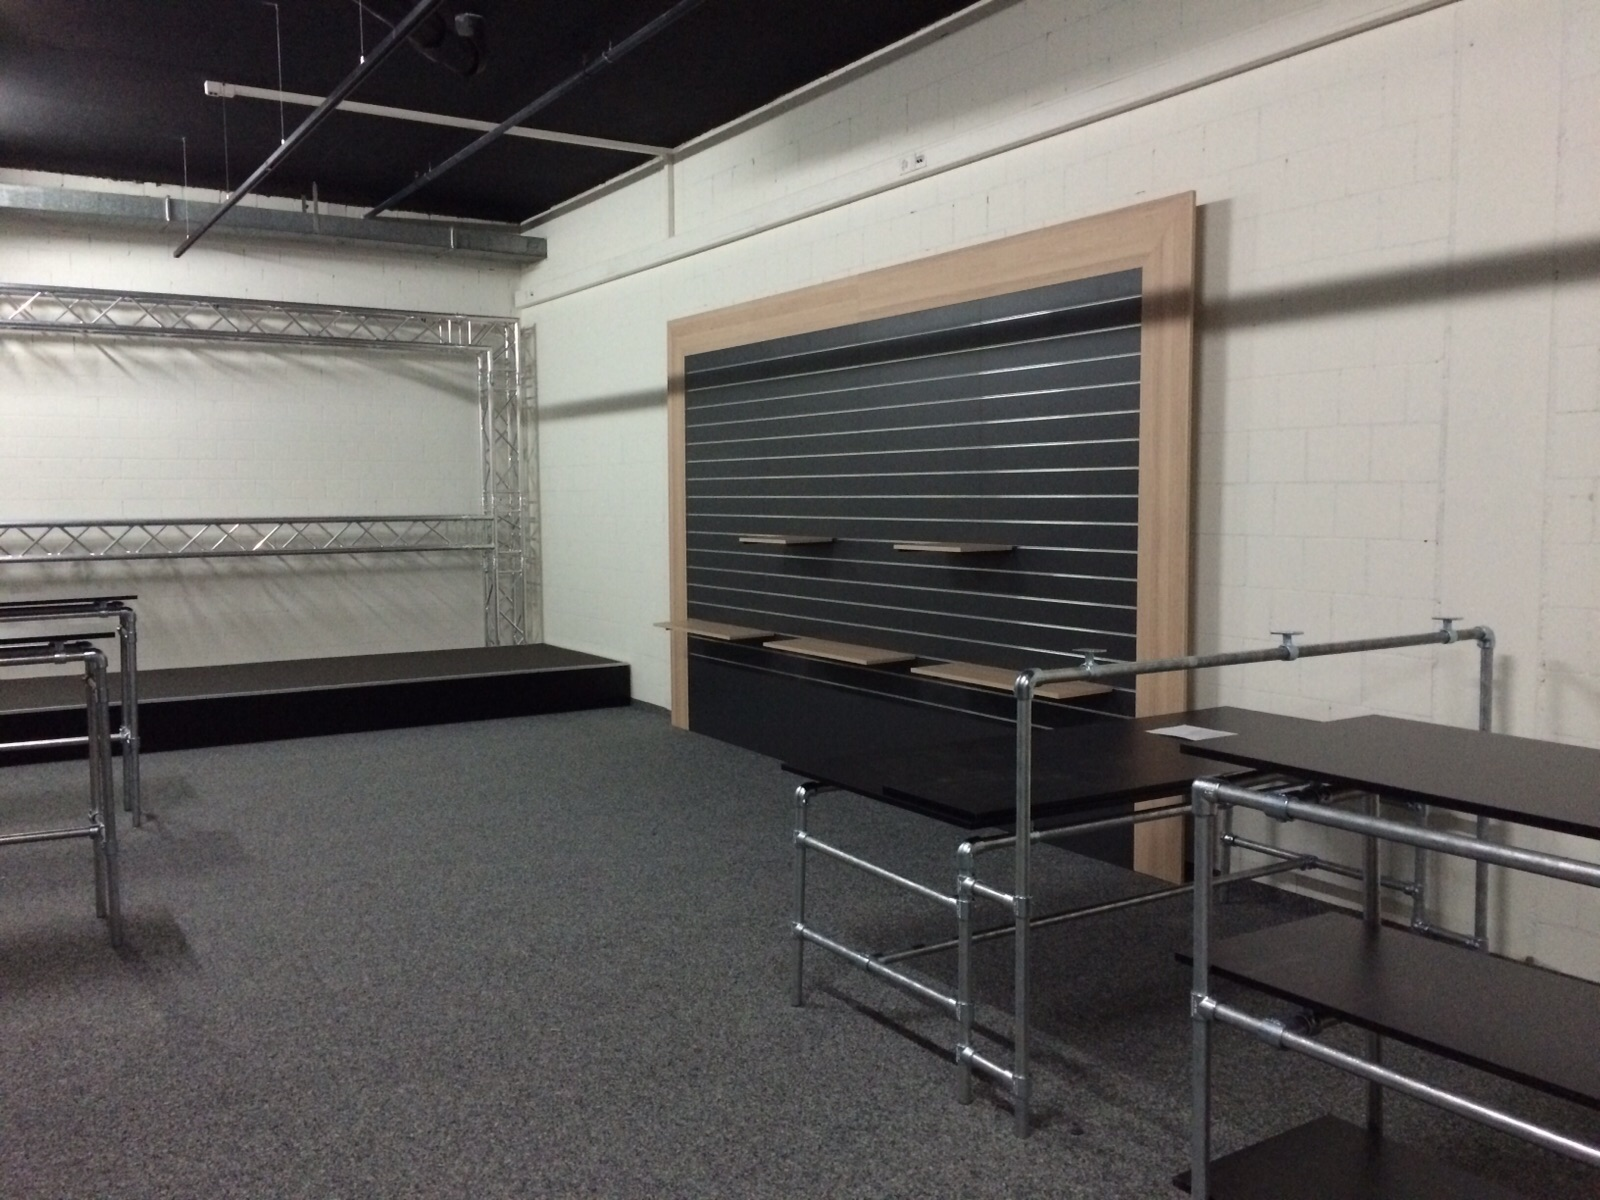 Brack Showroom Baustellenbericht 20150911 (9).JPG